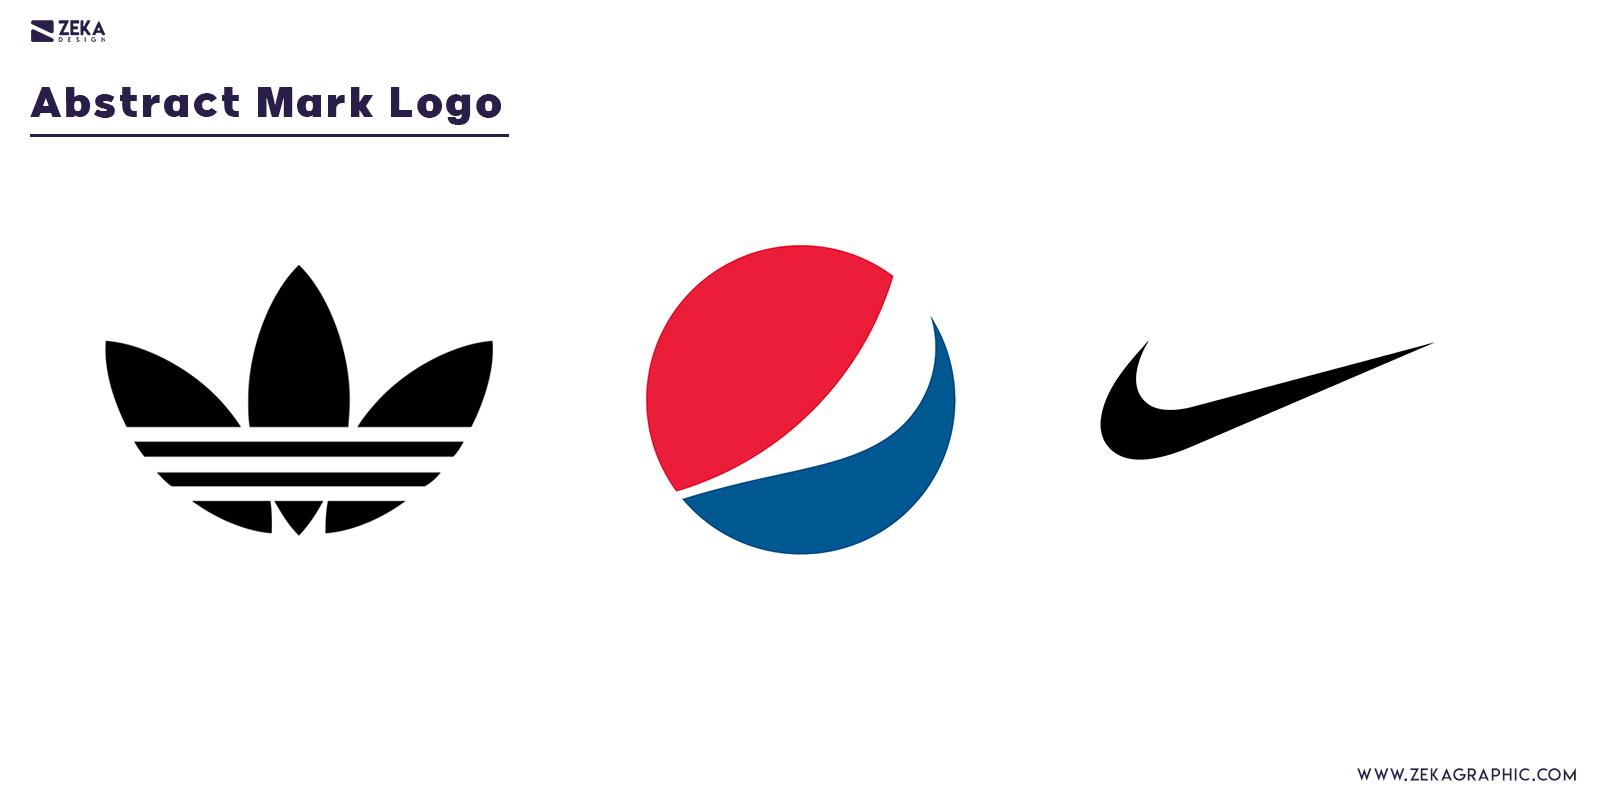 Abstract Mark Logo Design Type Graphic Design Blog Inspiration